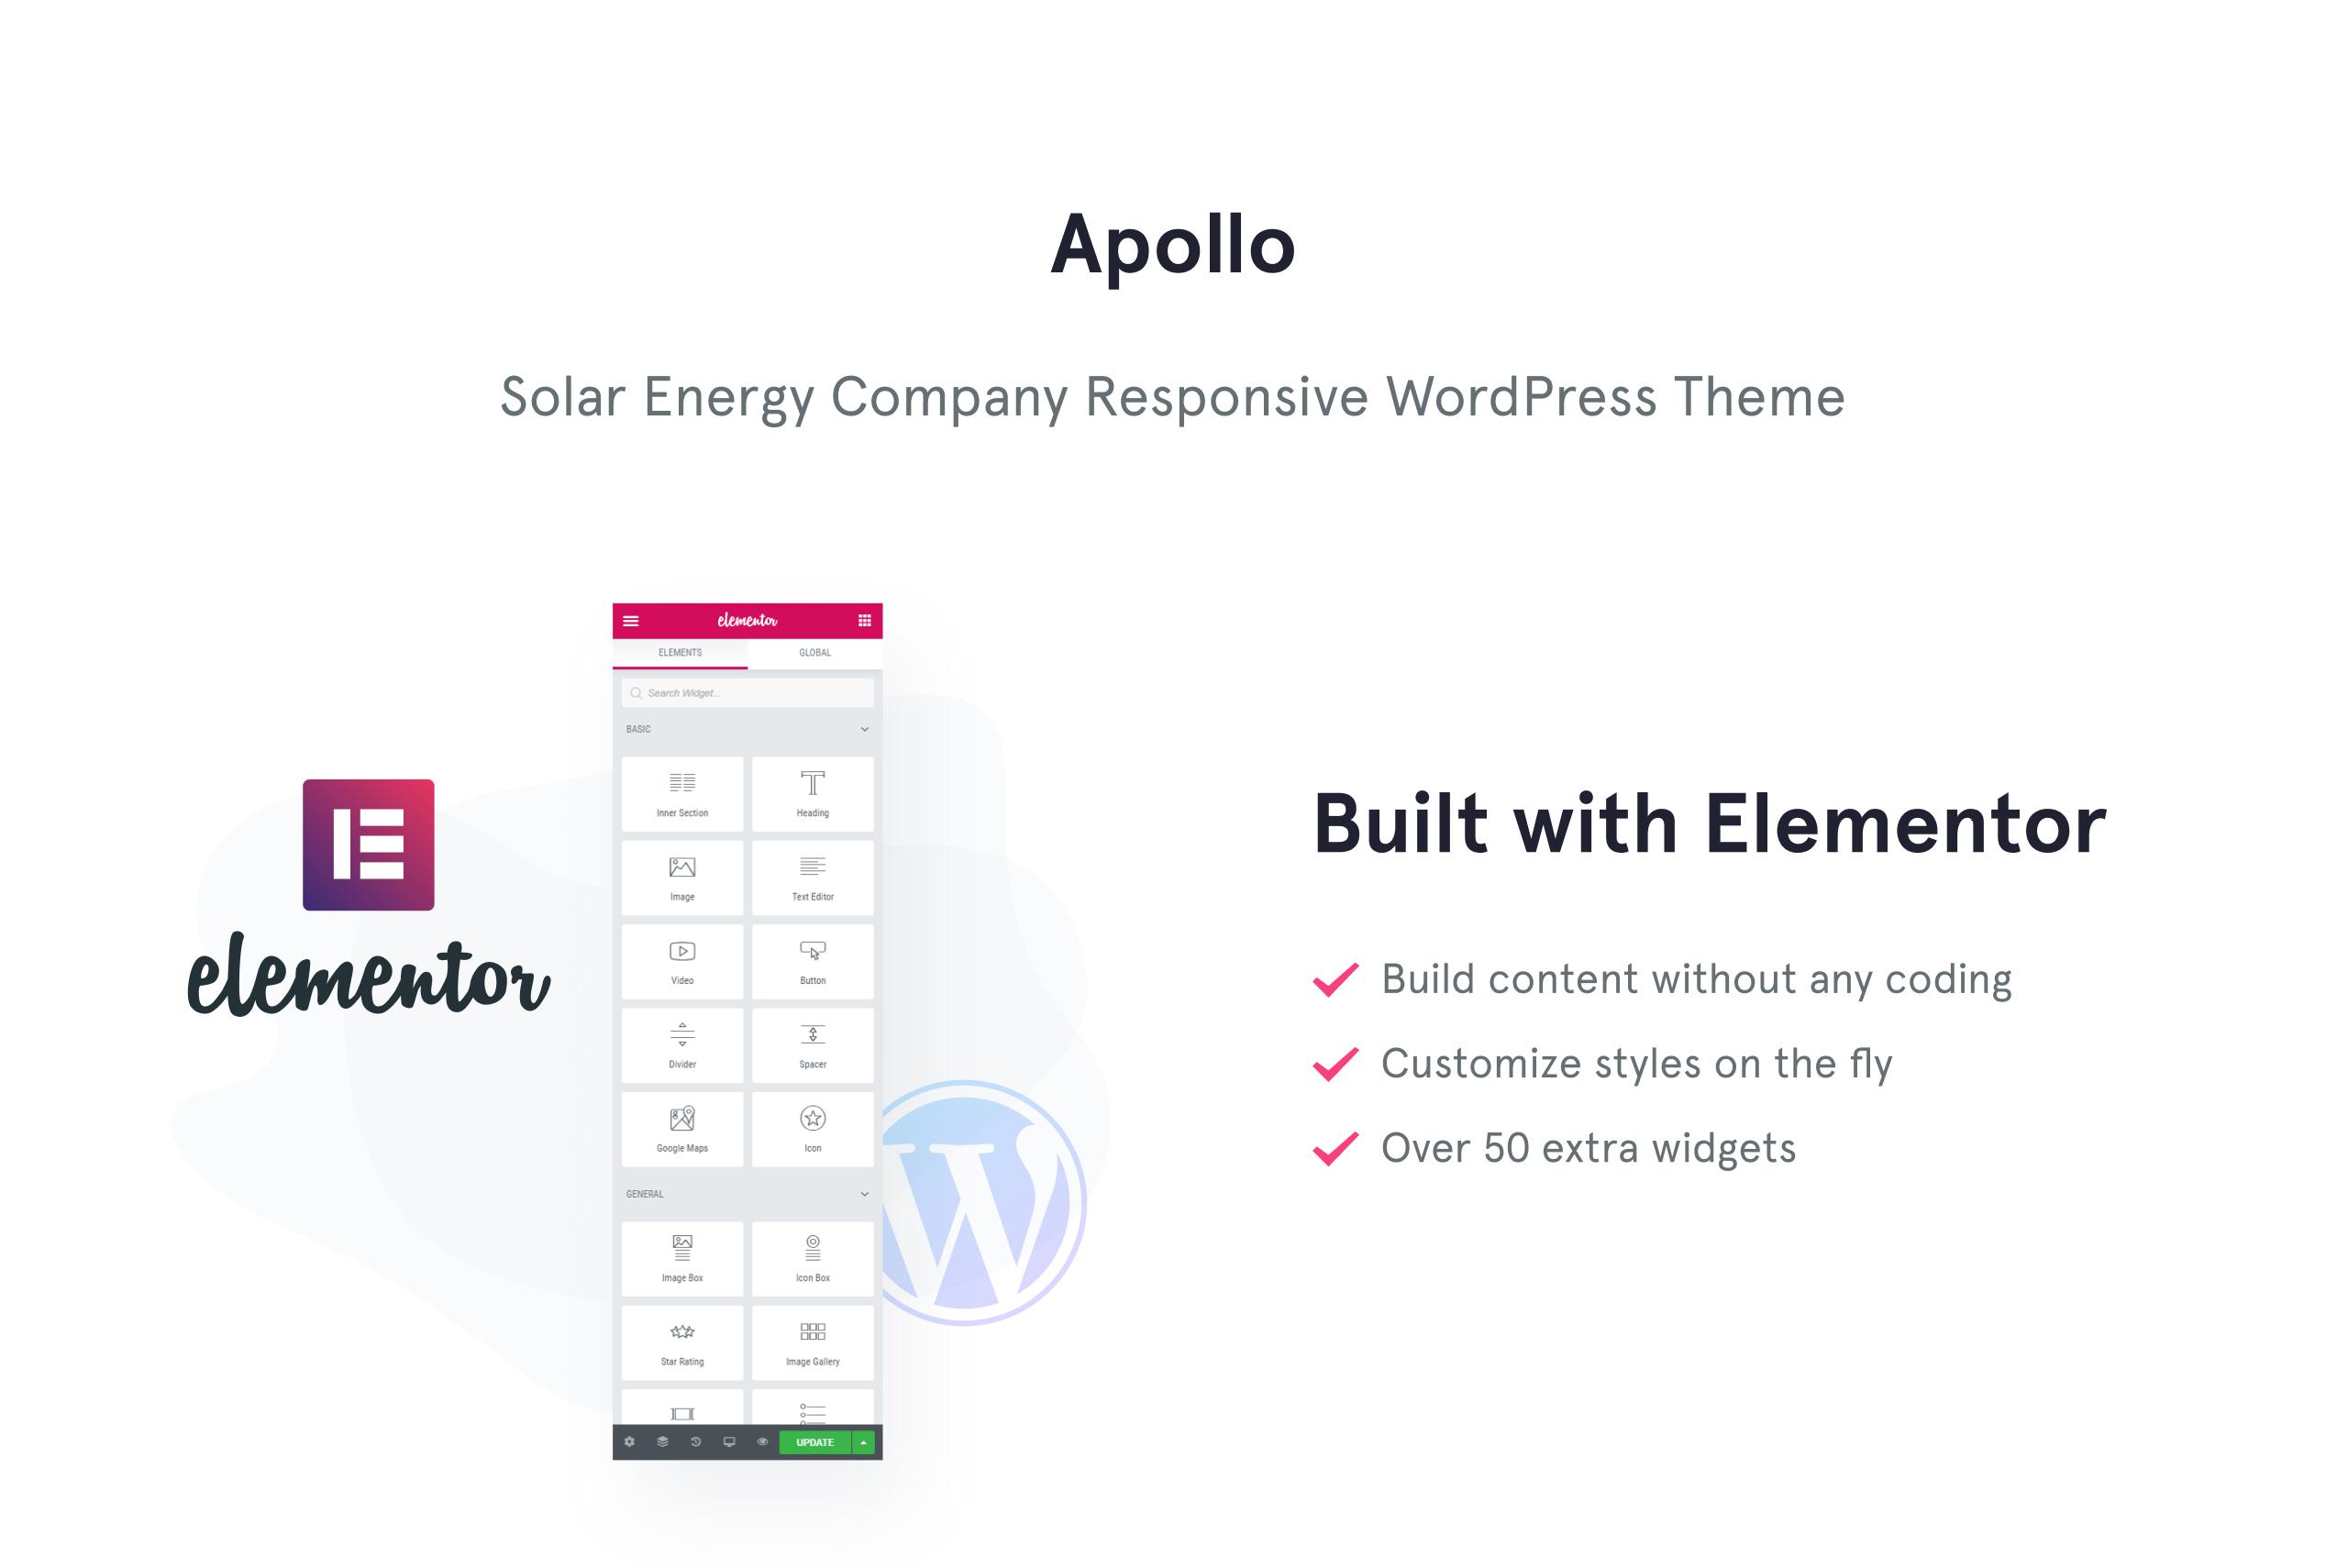 Apollo - Solar Energy Company Responsive WordPress Theme